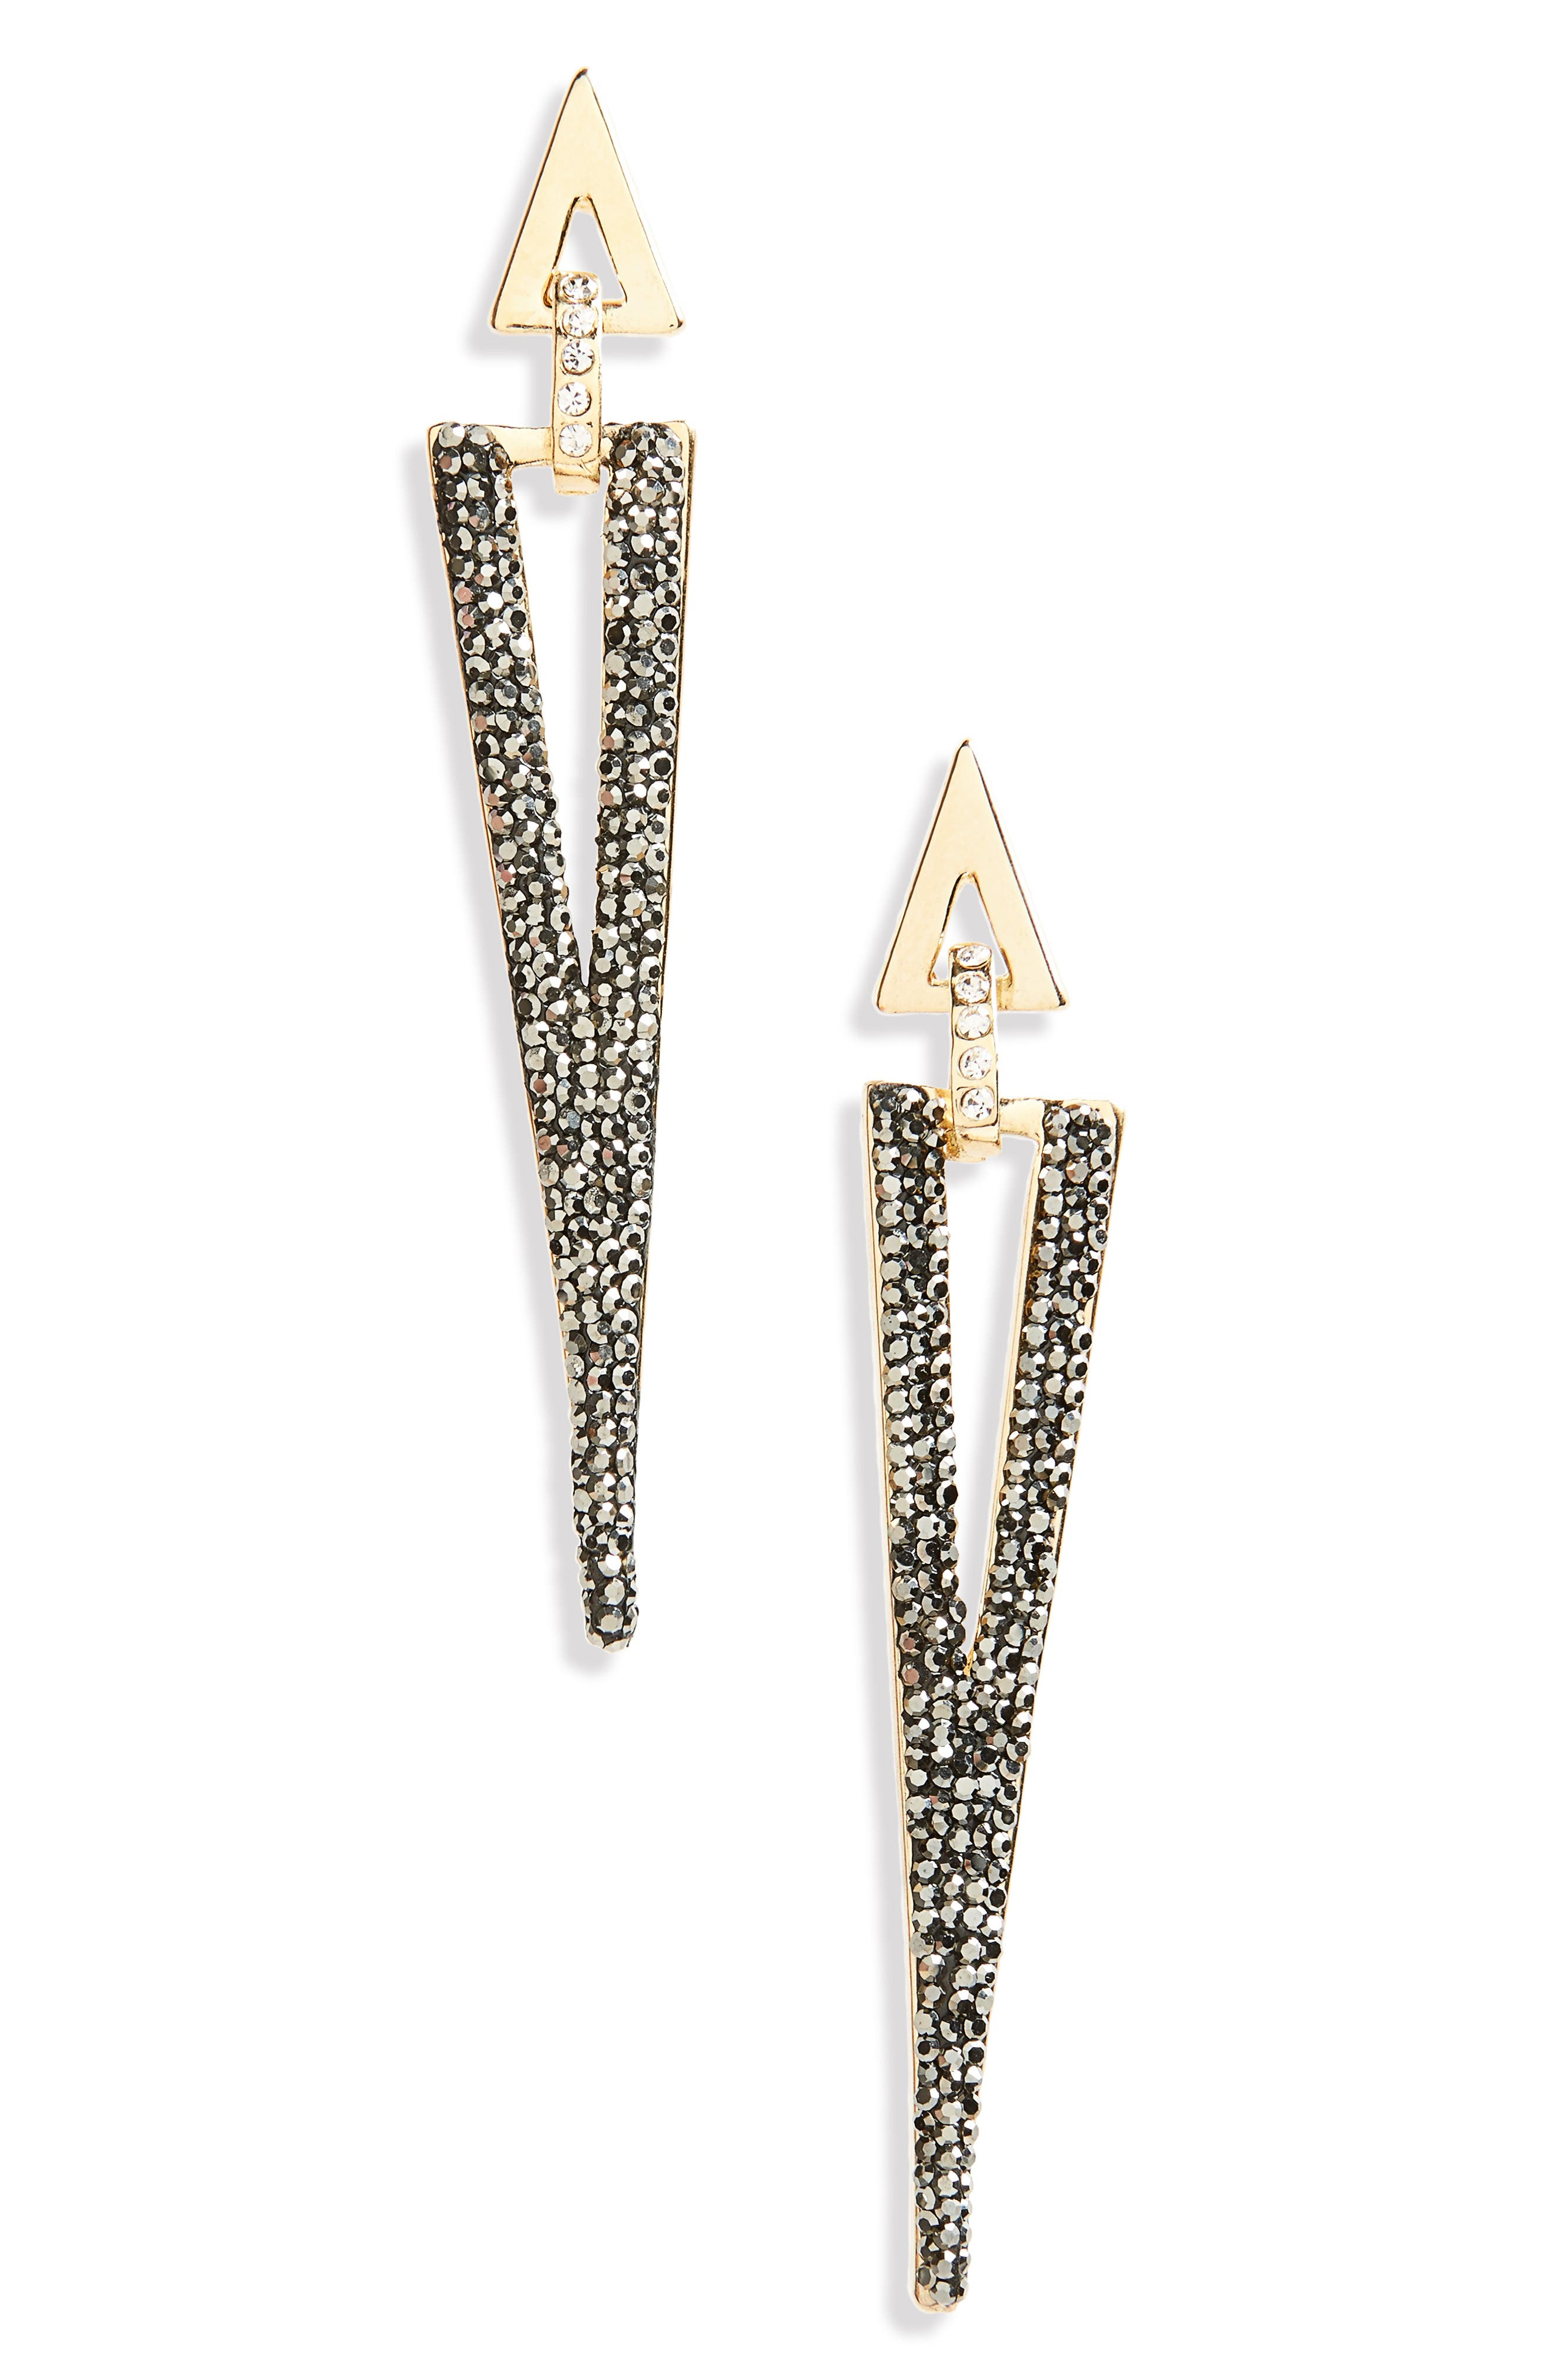 Main Image - Panacea Linear Luxe Triangle Earrings